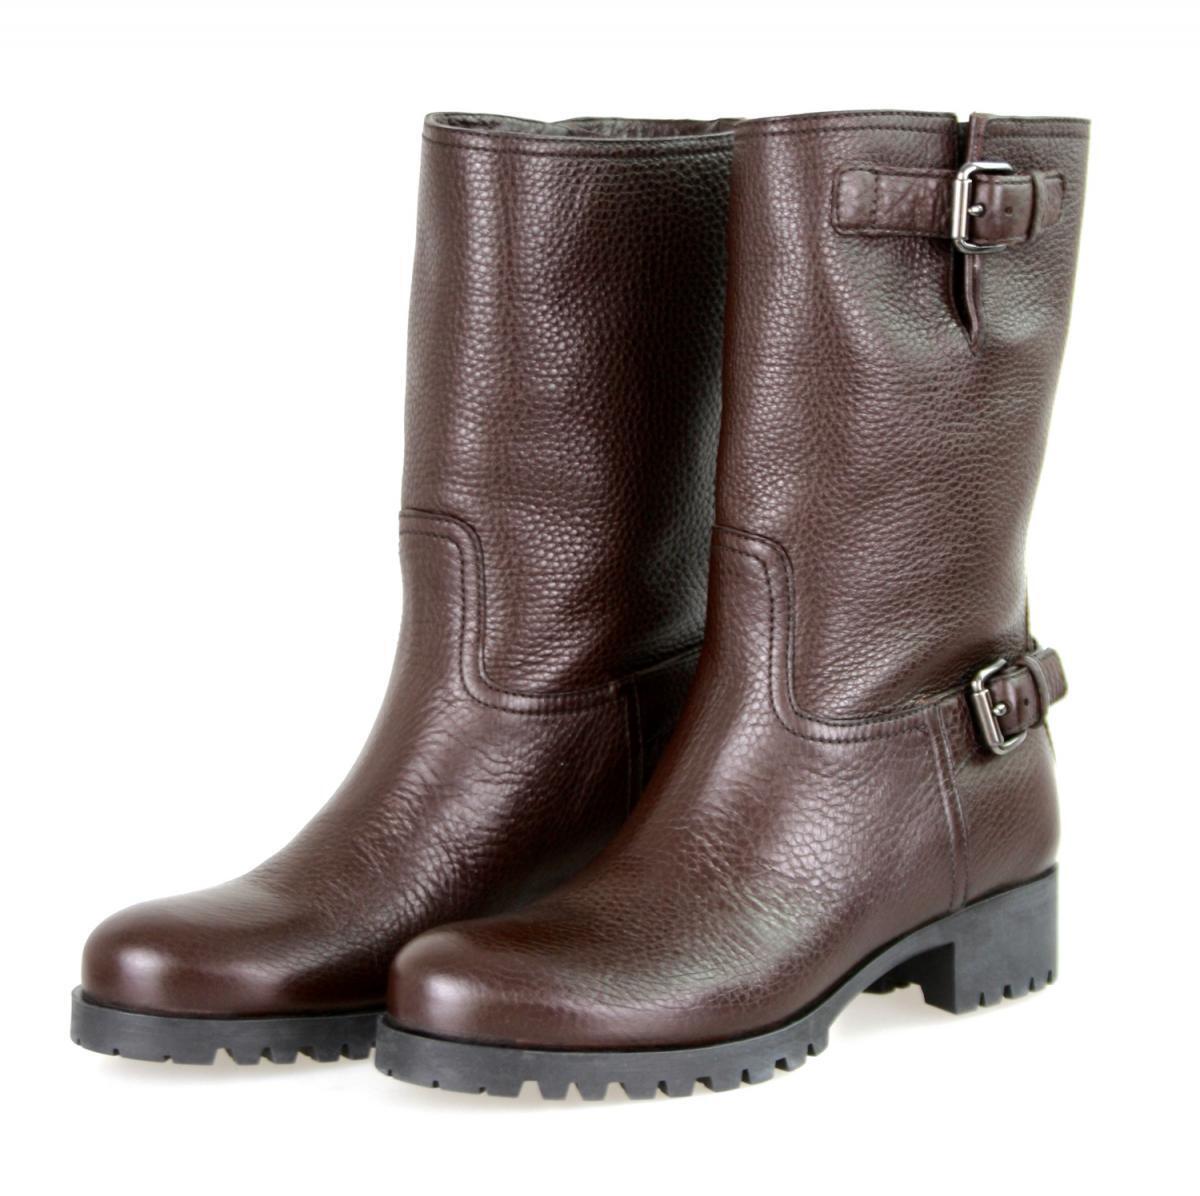 Lujo prada botín zapatos botas 3u5785 Caffe marrón nuevo 38 38,5